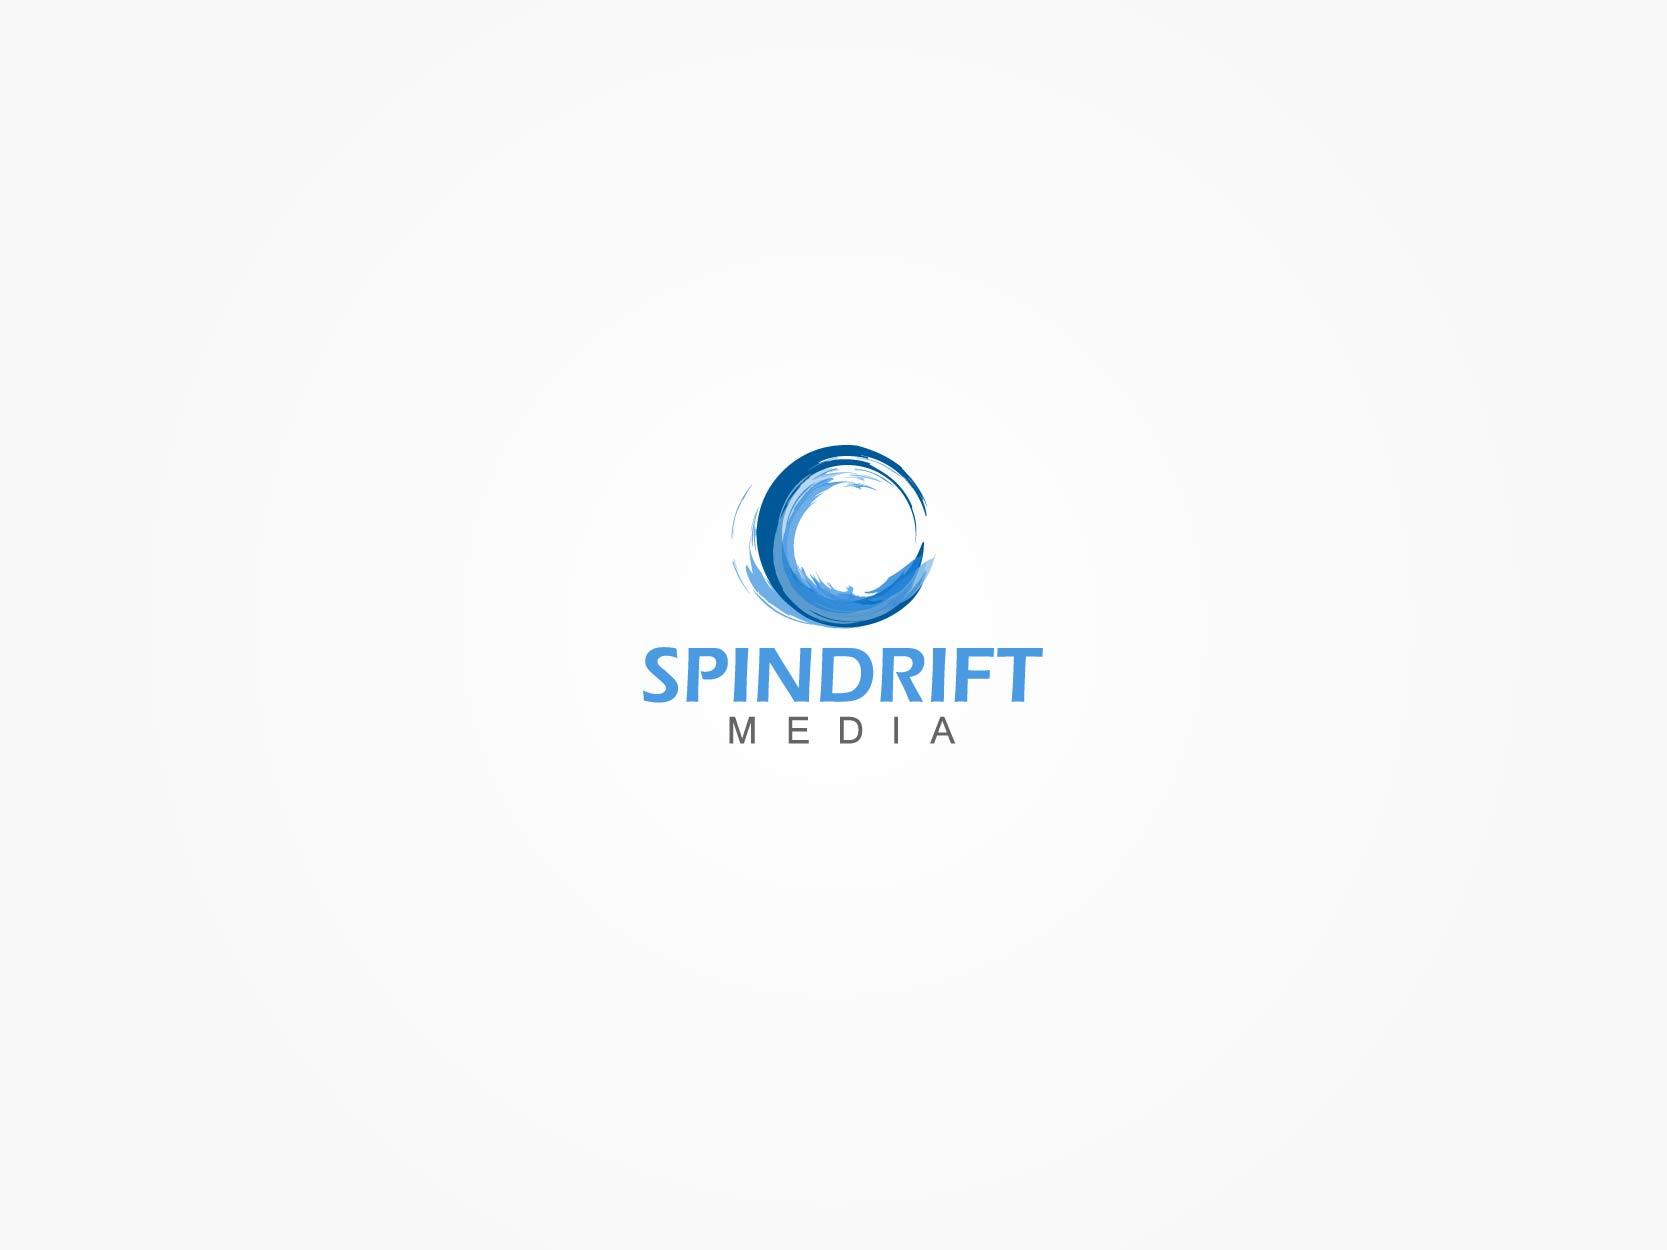 Logo Design by Osi Indra - Entry No. 73 in the Logo Design Contest Inspiring Logo Design for Spindrift Media.